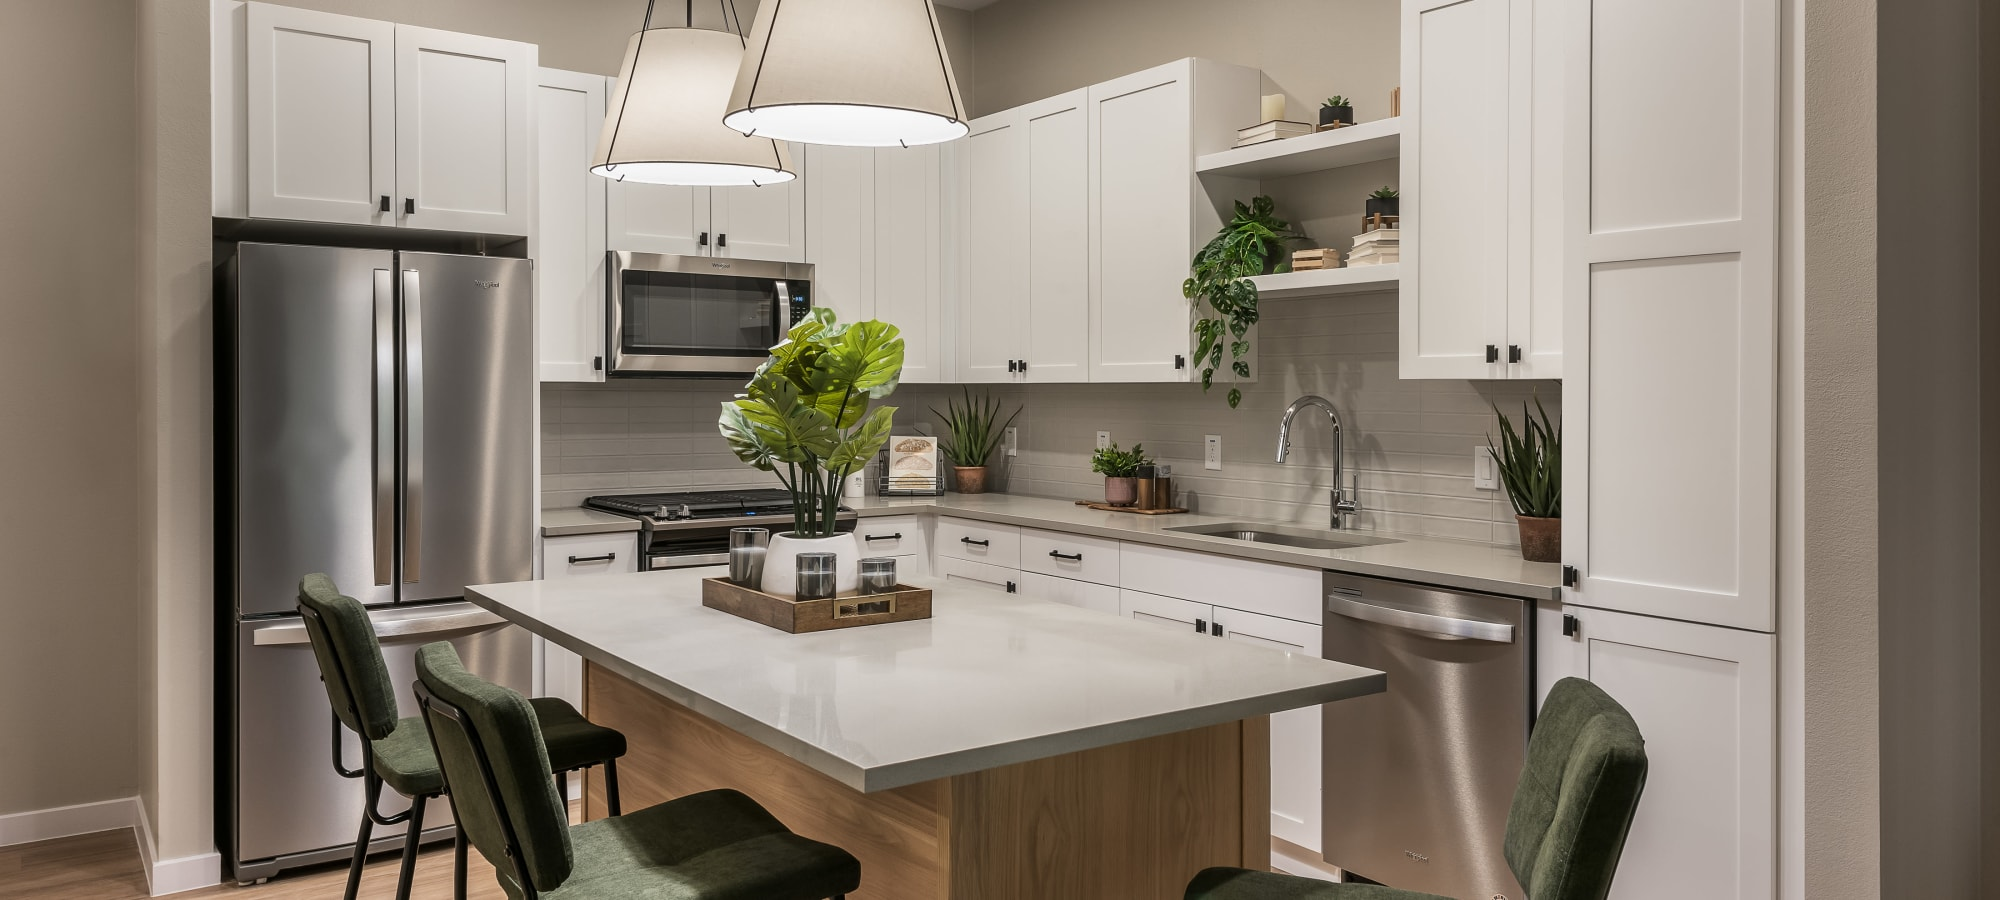 Luxurious kitchen with stainless steel appliances at Gramercy Scottsdale in Scottsdale, Arizona